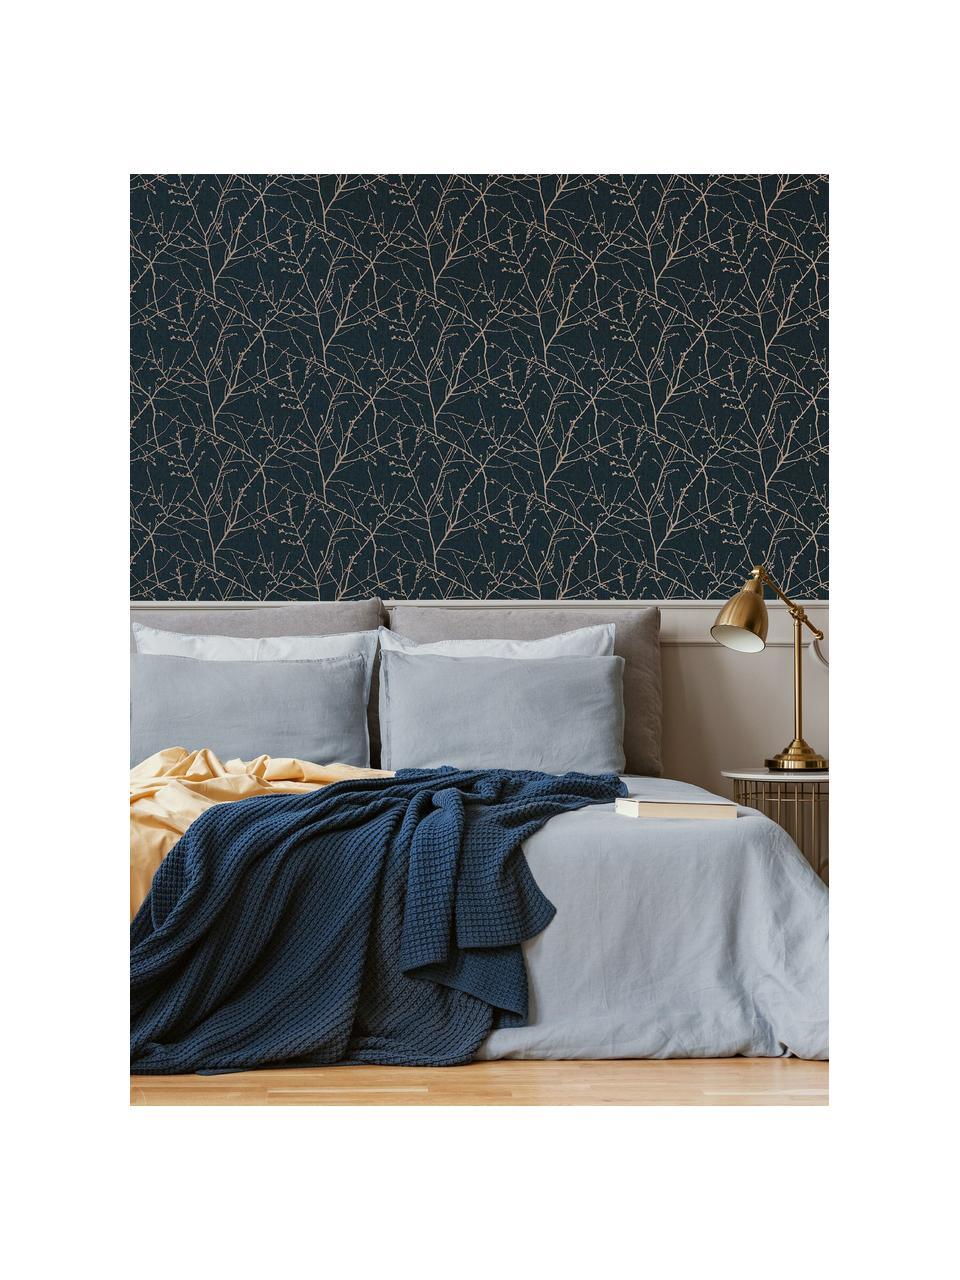 Tapete Nature Blue, Vlies, Blau, Kupferfarben, 52 x 1005 cm